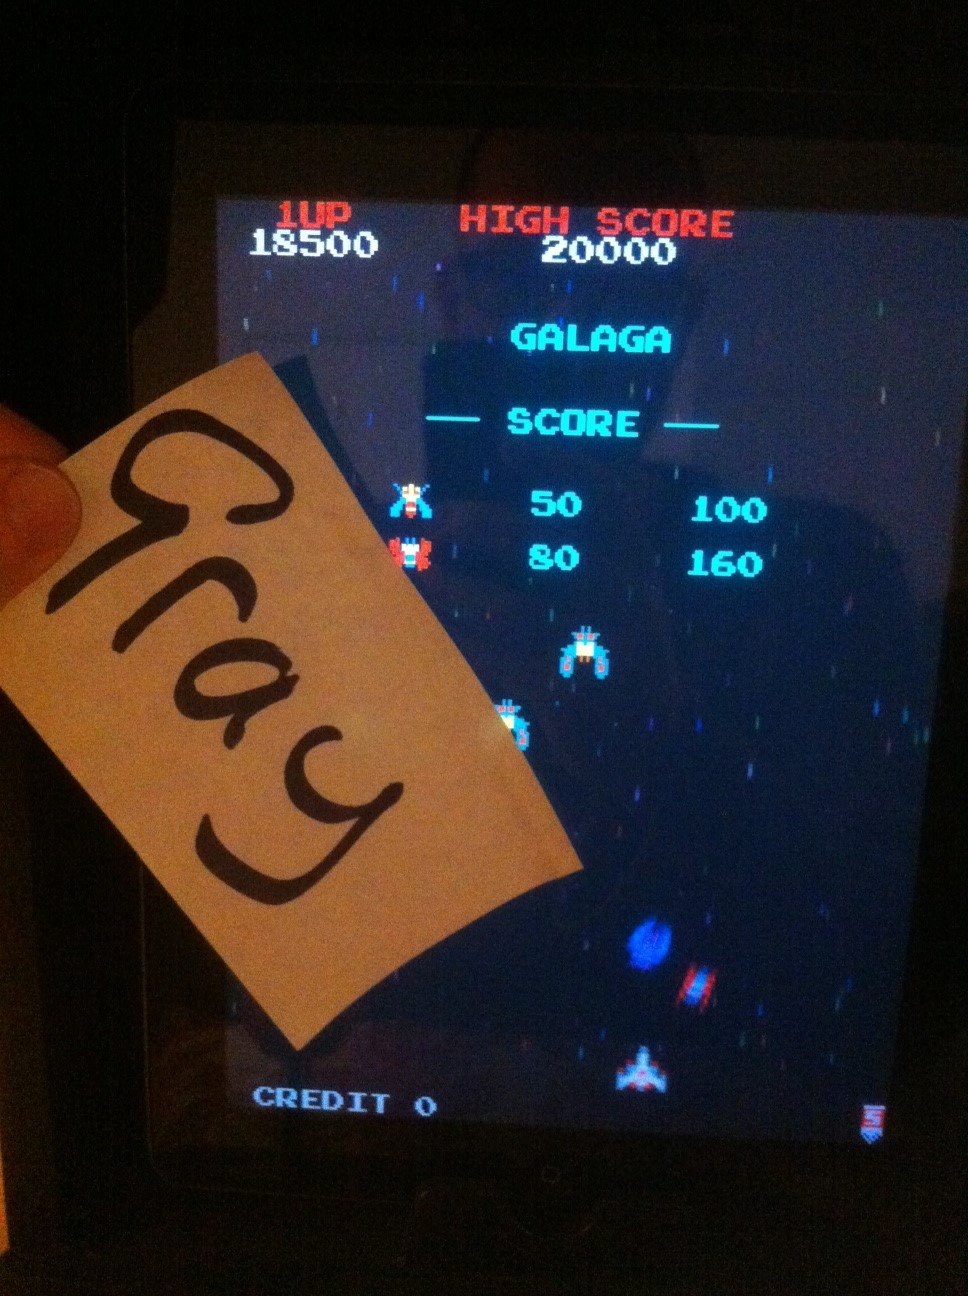 Galaga 18,500 points